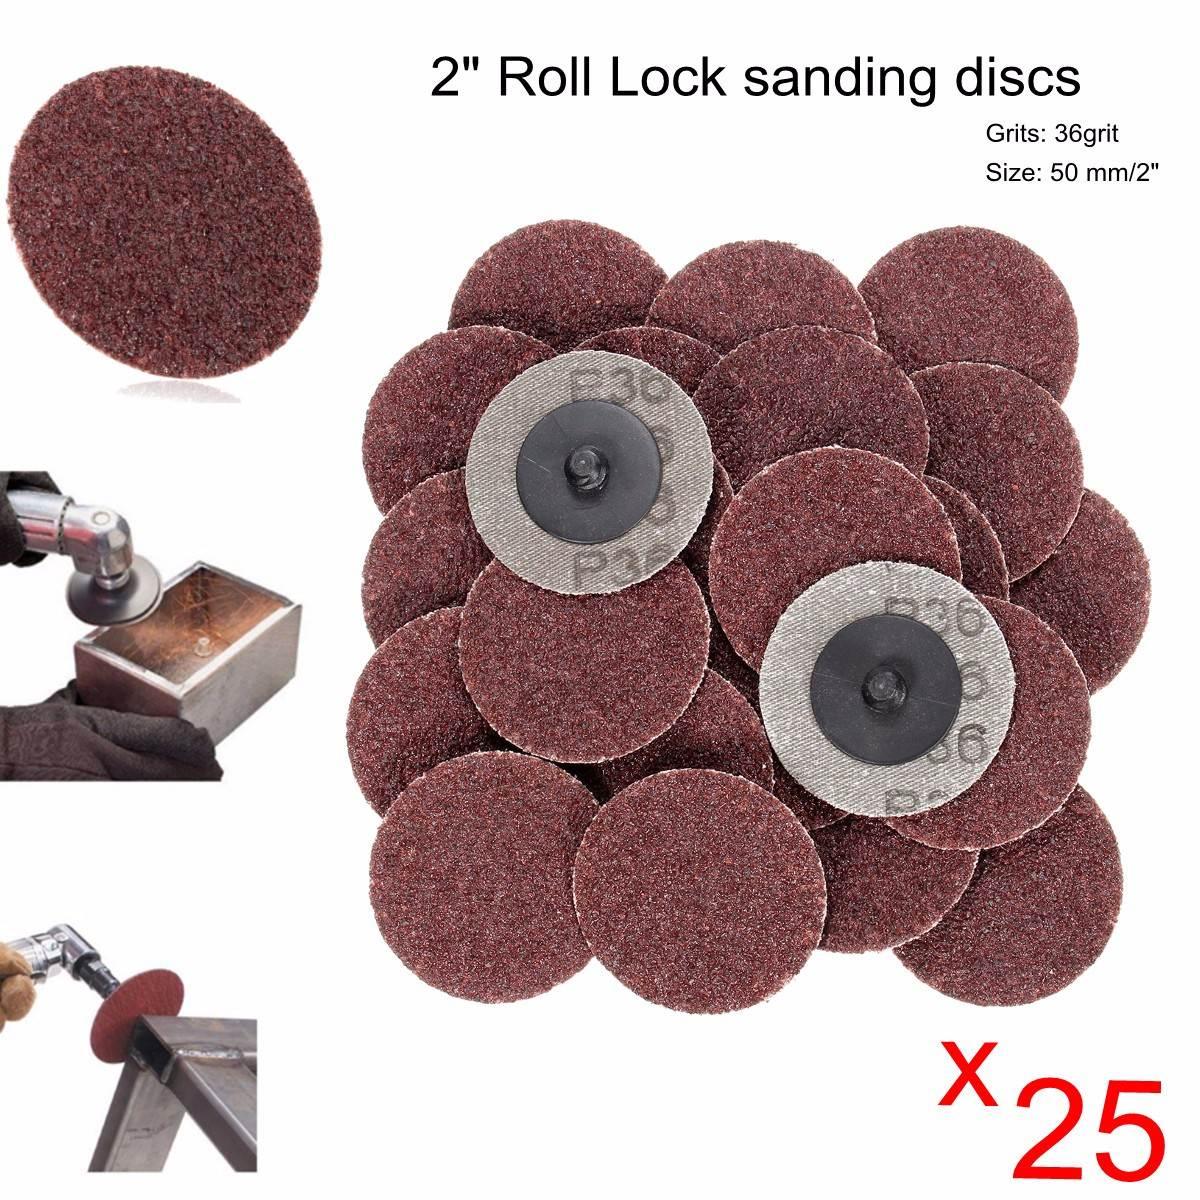 25pcs 2 Inch 36 Grit R-Type Abrasive Sanding Discs Roll Lock Sanding Disc